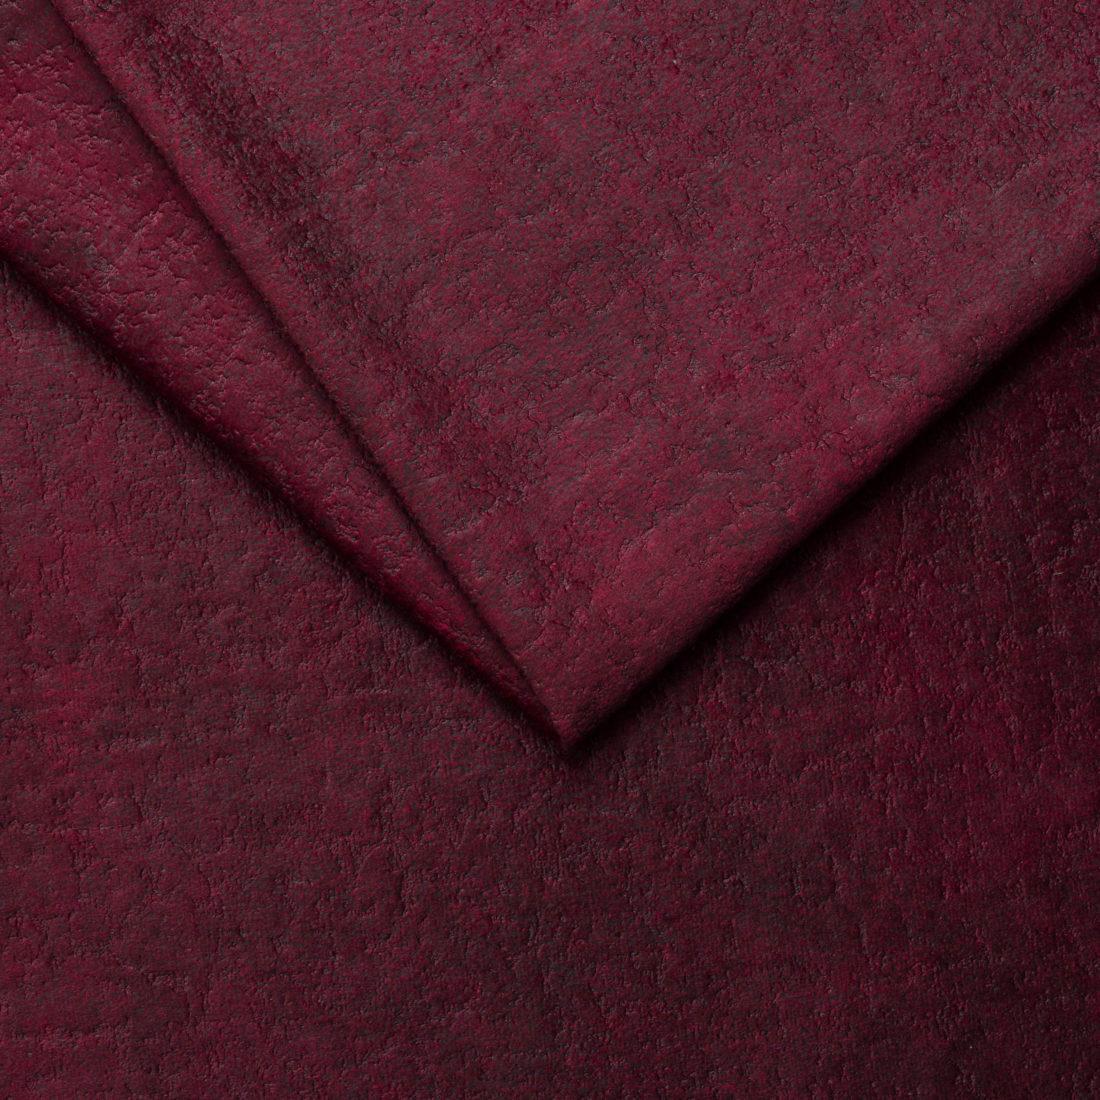 Меблева тканина Infinity 7 Ruby Red, велюр